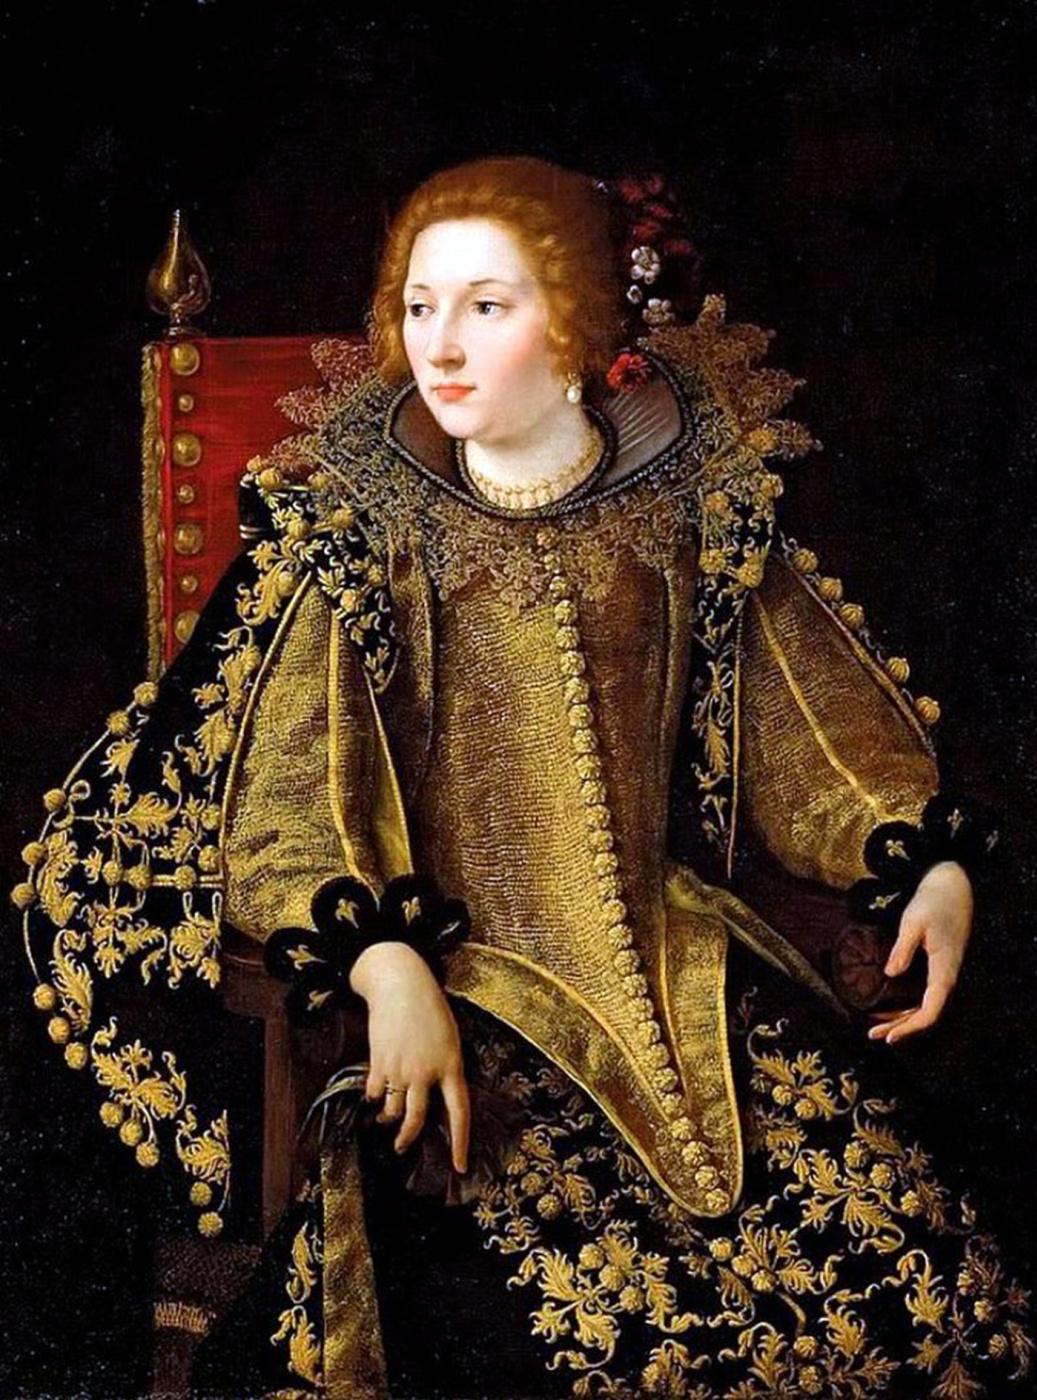 Artemisia Gentileschi. Portrait of a sitting lady